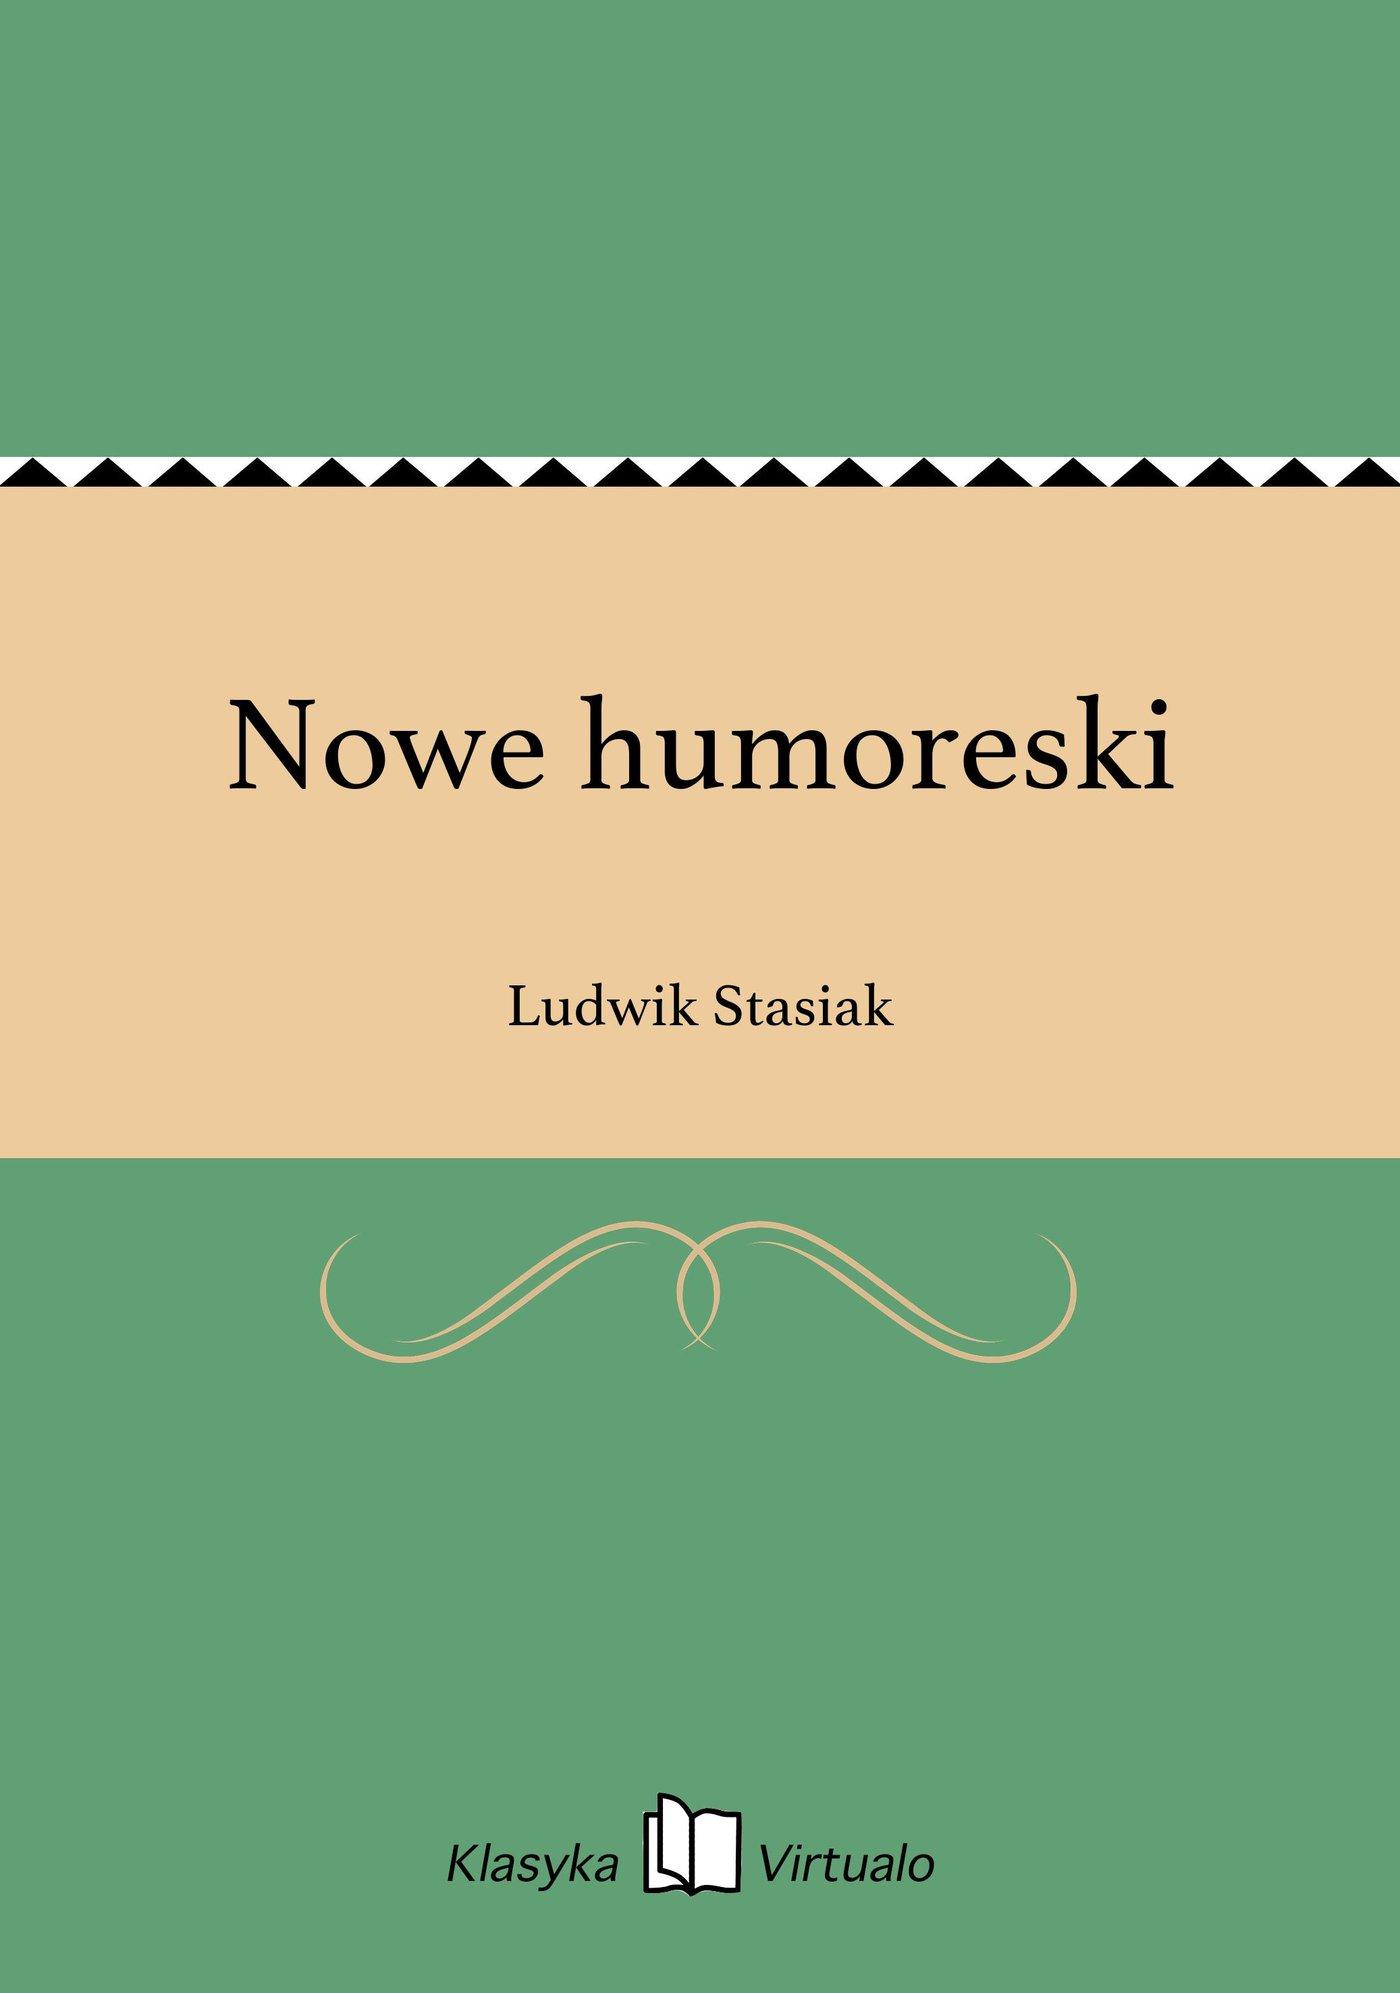 Nowe humoreski - Ebook (Książka na Kindle) do pobrania w formacie MOBI